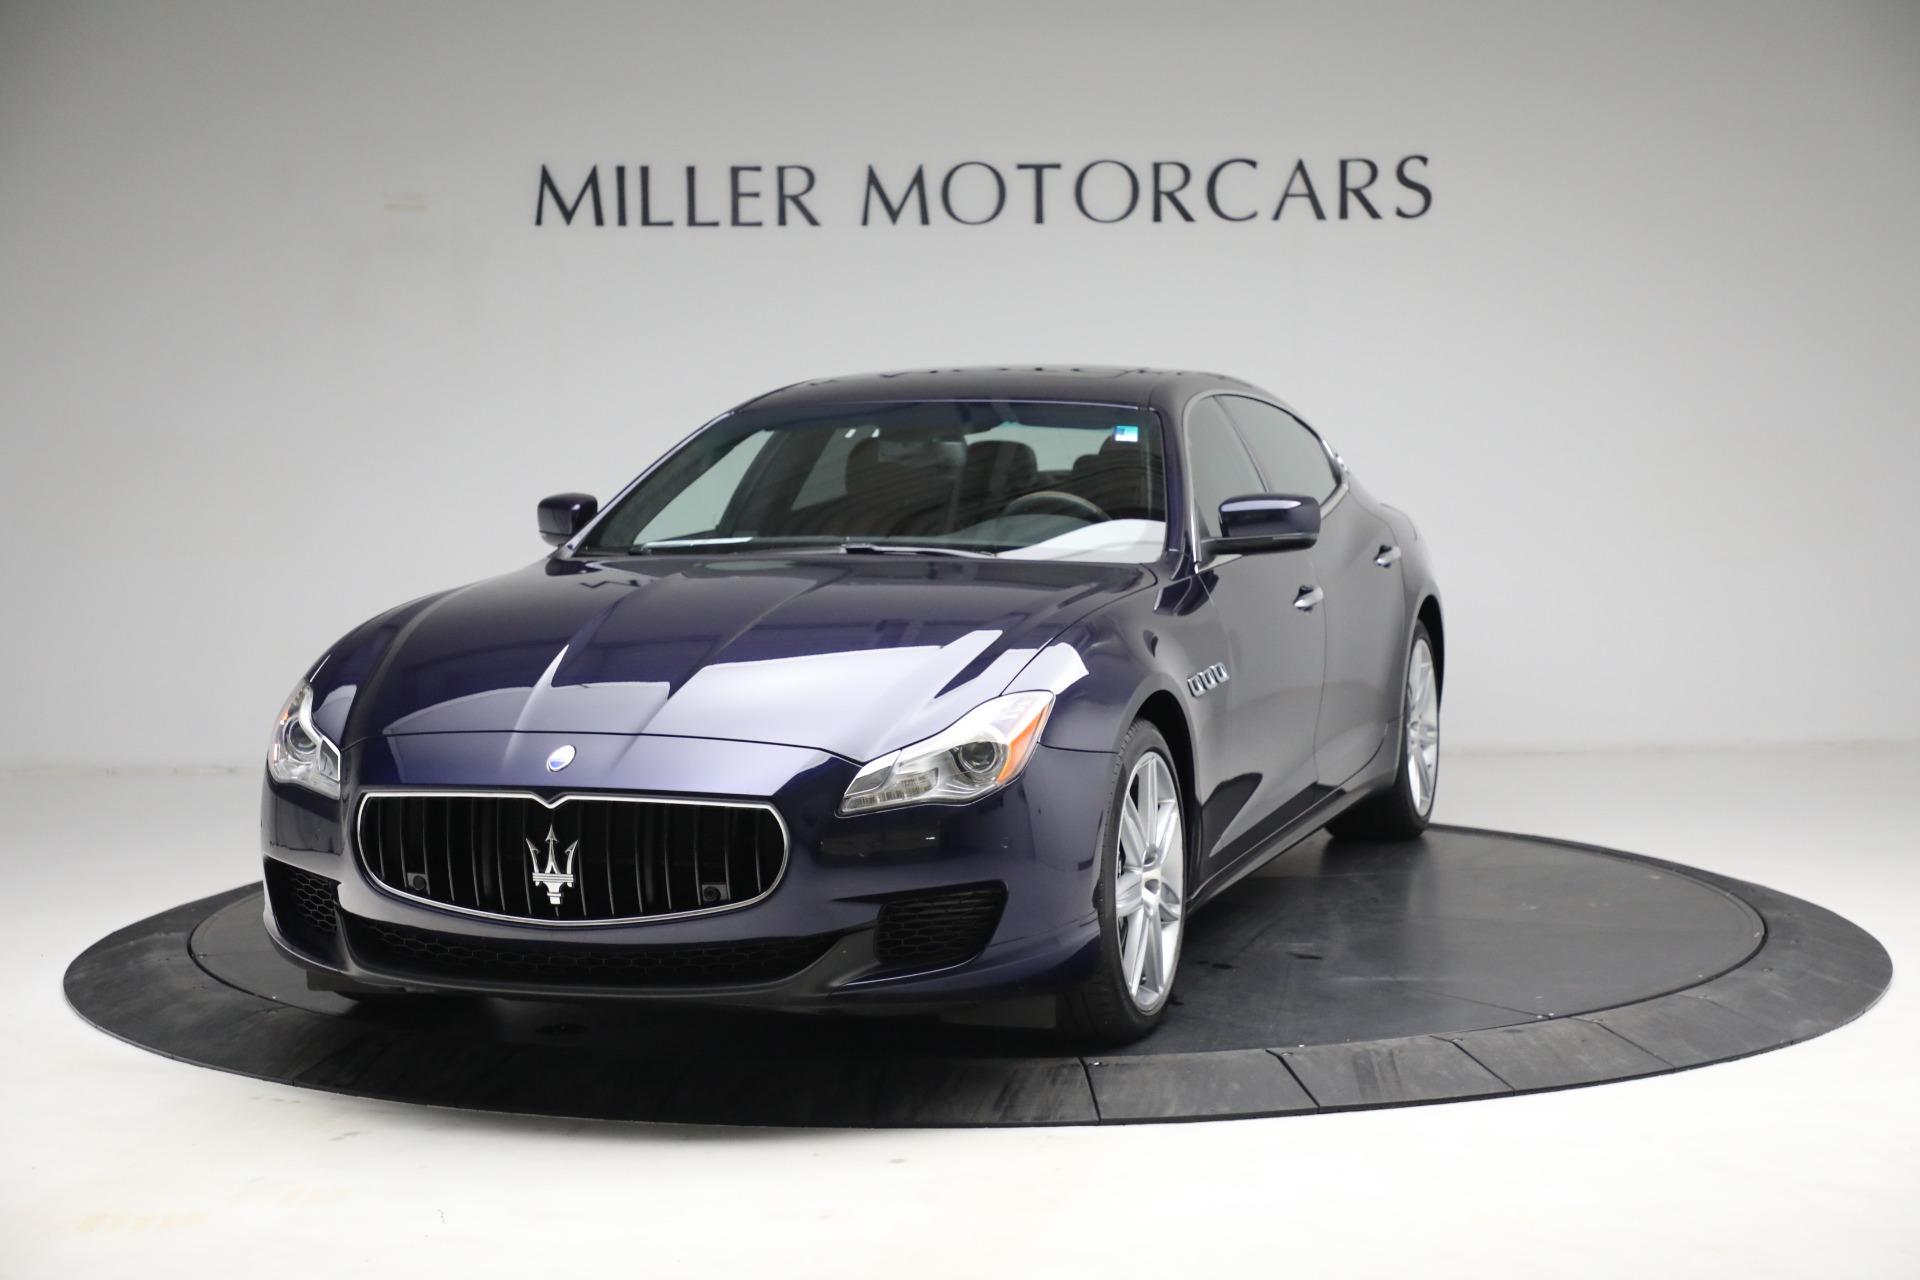 Used 2014 Maserati Quattroporte S Q4 for sale $42,900 at Pagani of Greenwich in Greenwich CT 06830 1